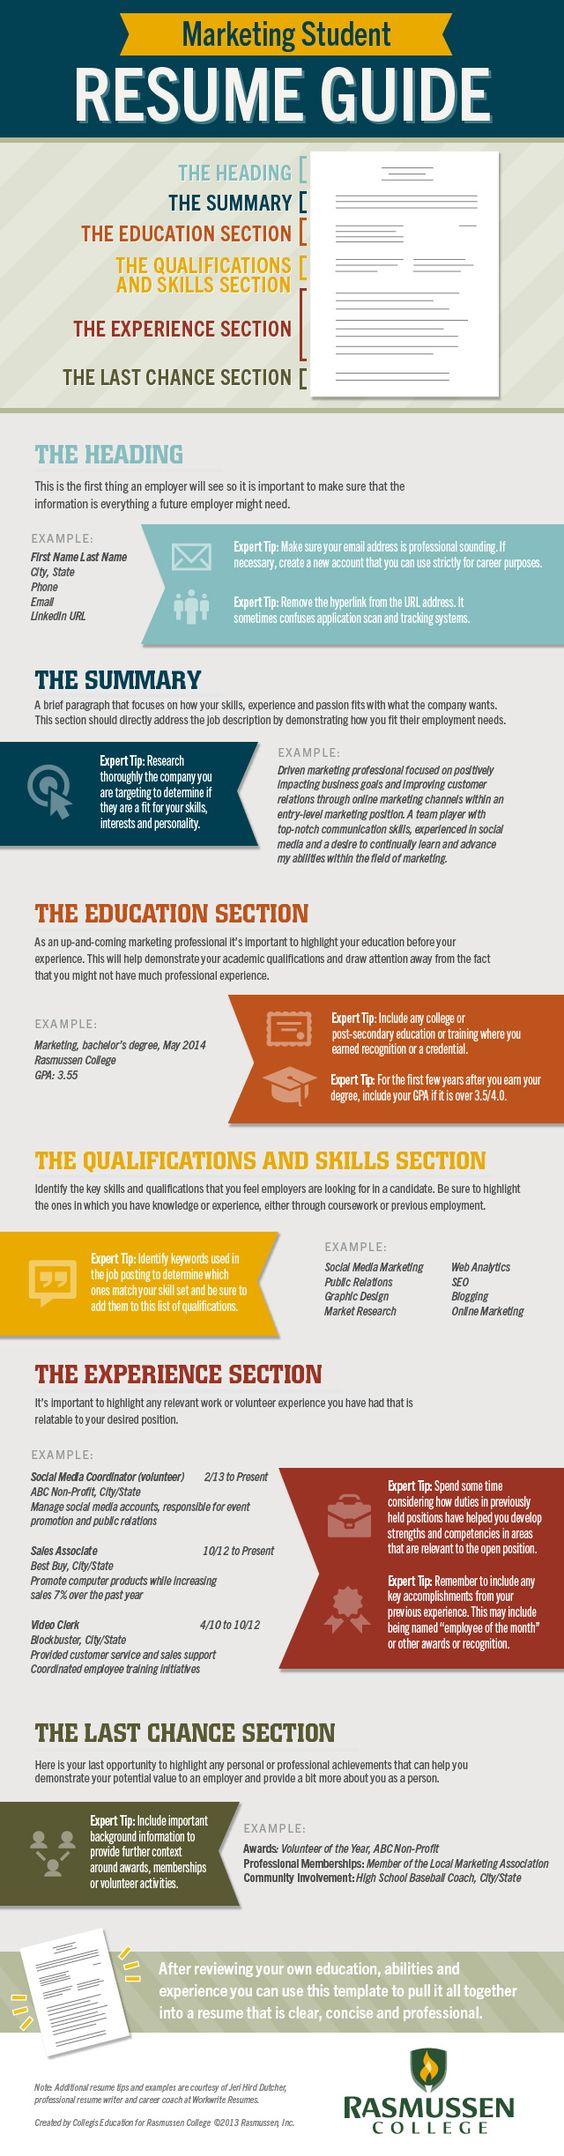 Resume, Student resume and Marketing on Pinterest